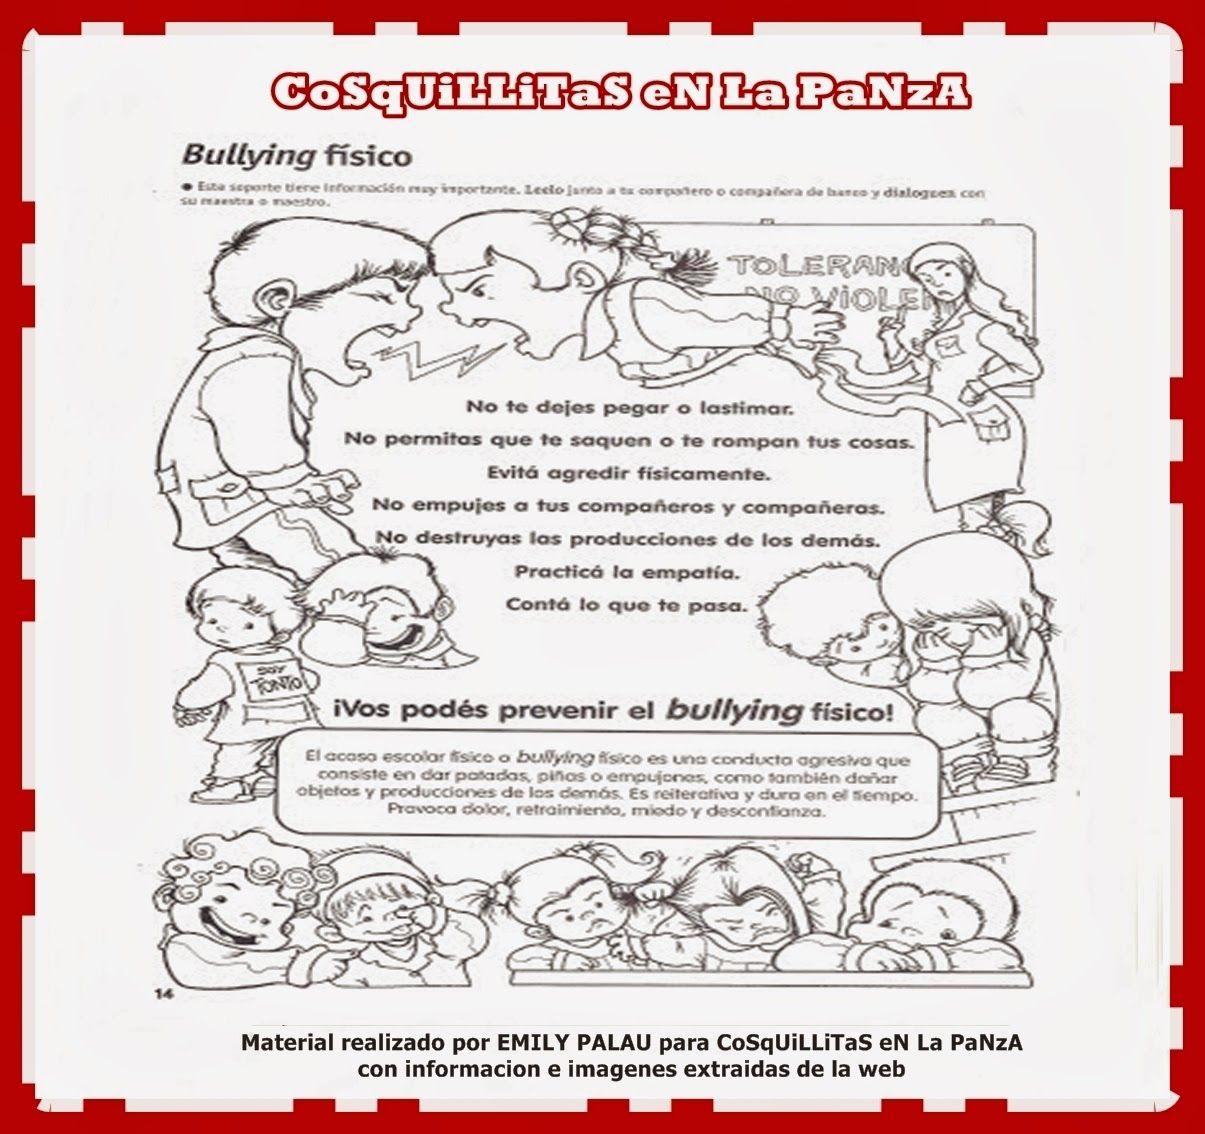 Pin de Domingo Antonio Gomez en bulling | Pinterest | Cosas de la ...